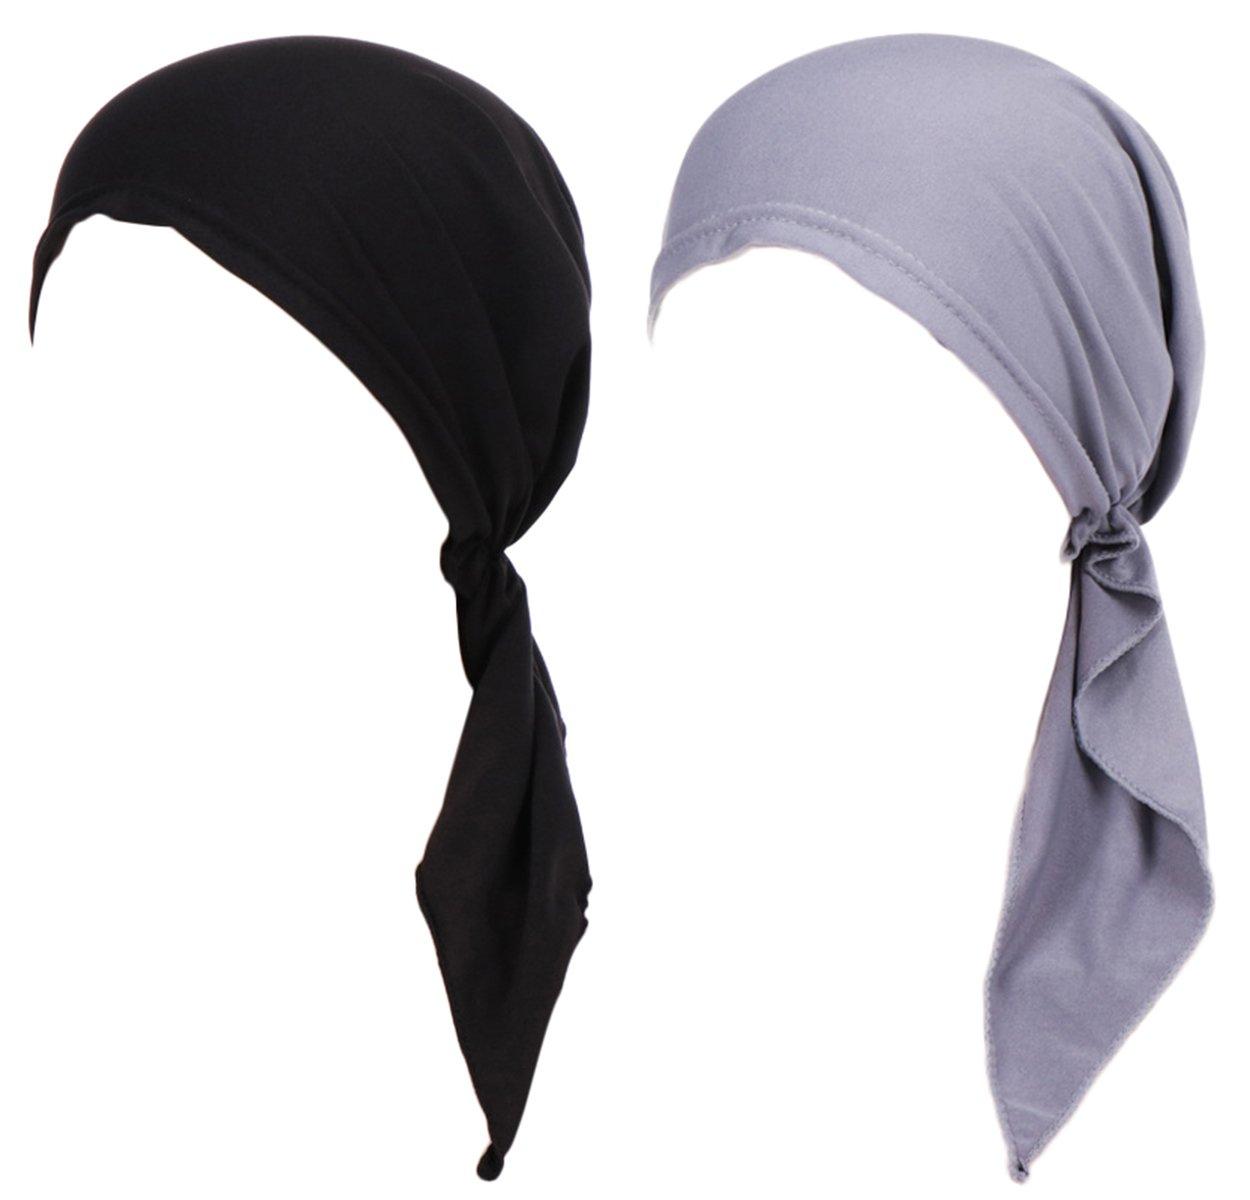 Summer Chemo Scarf Lightweight Silky Beanie Ruffle Cap Cancer Headwear for Womens (Black+Grey)